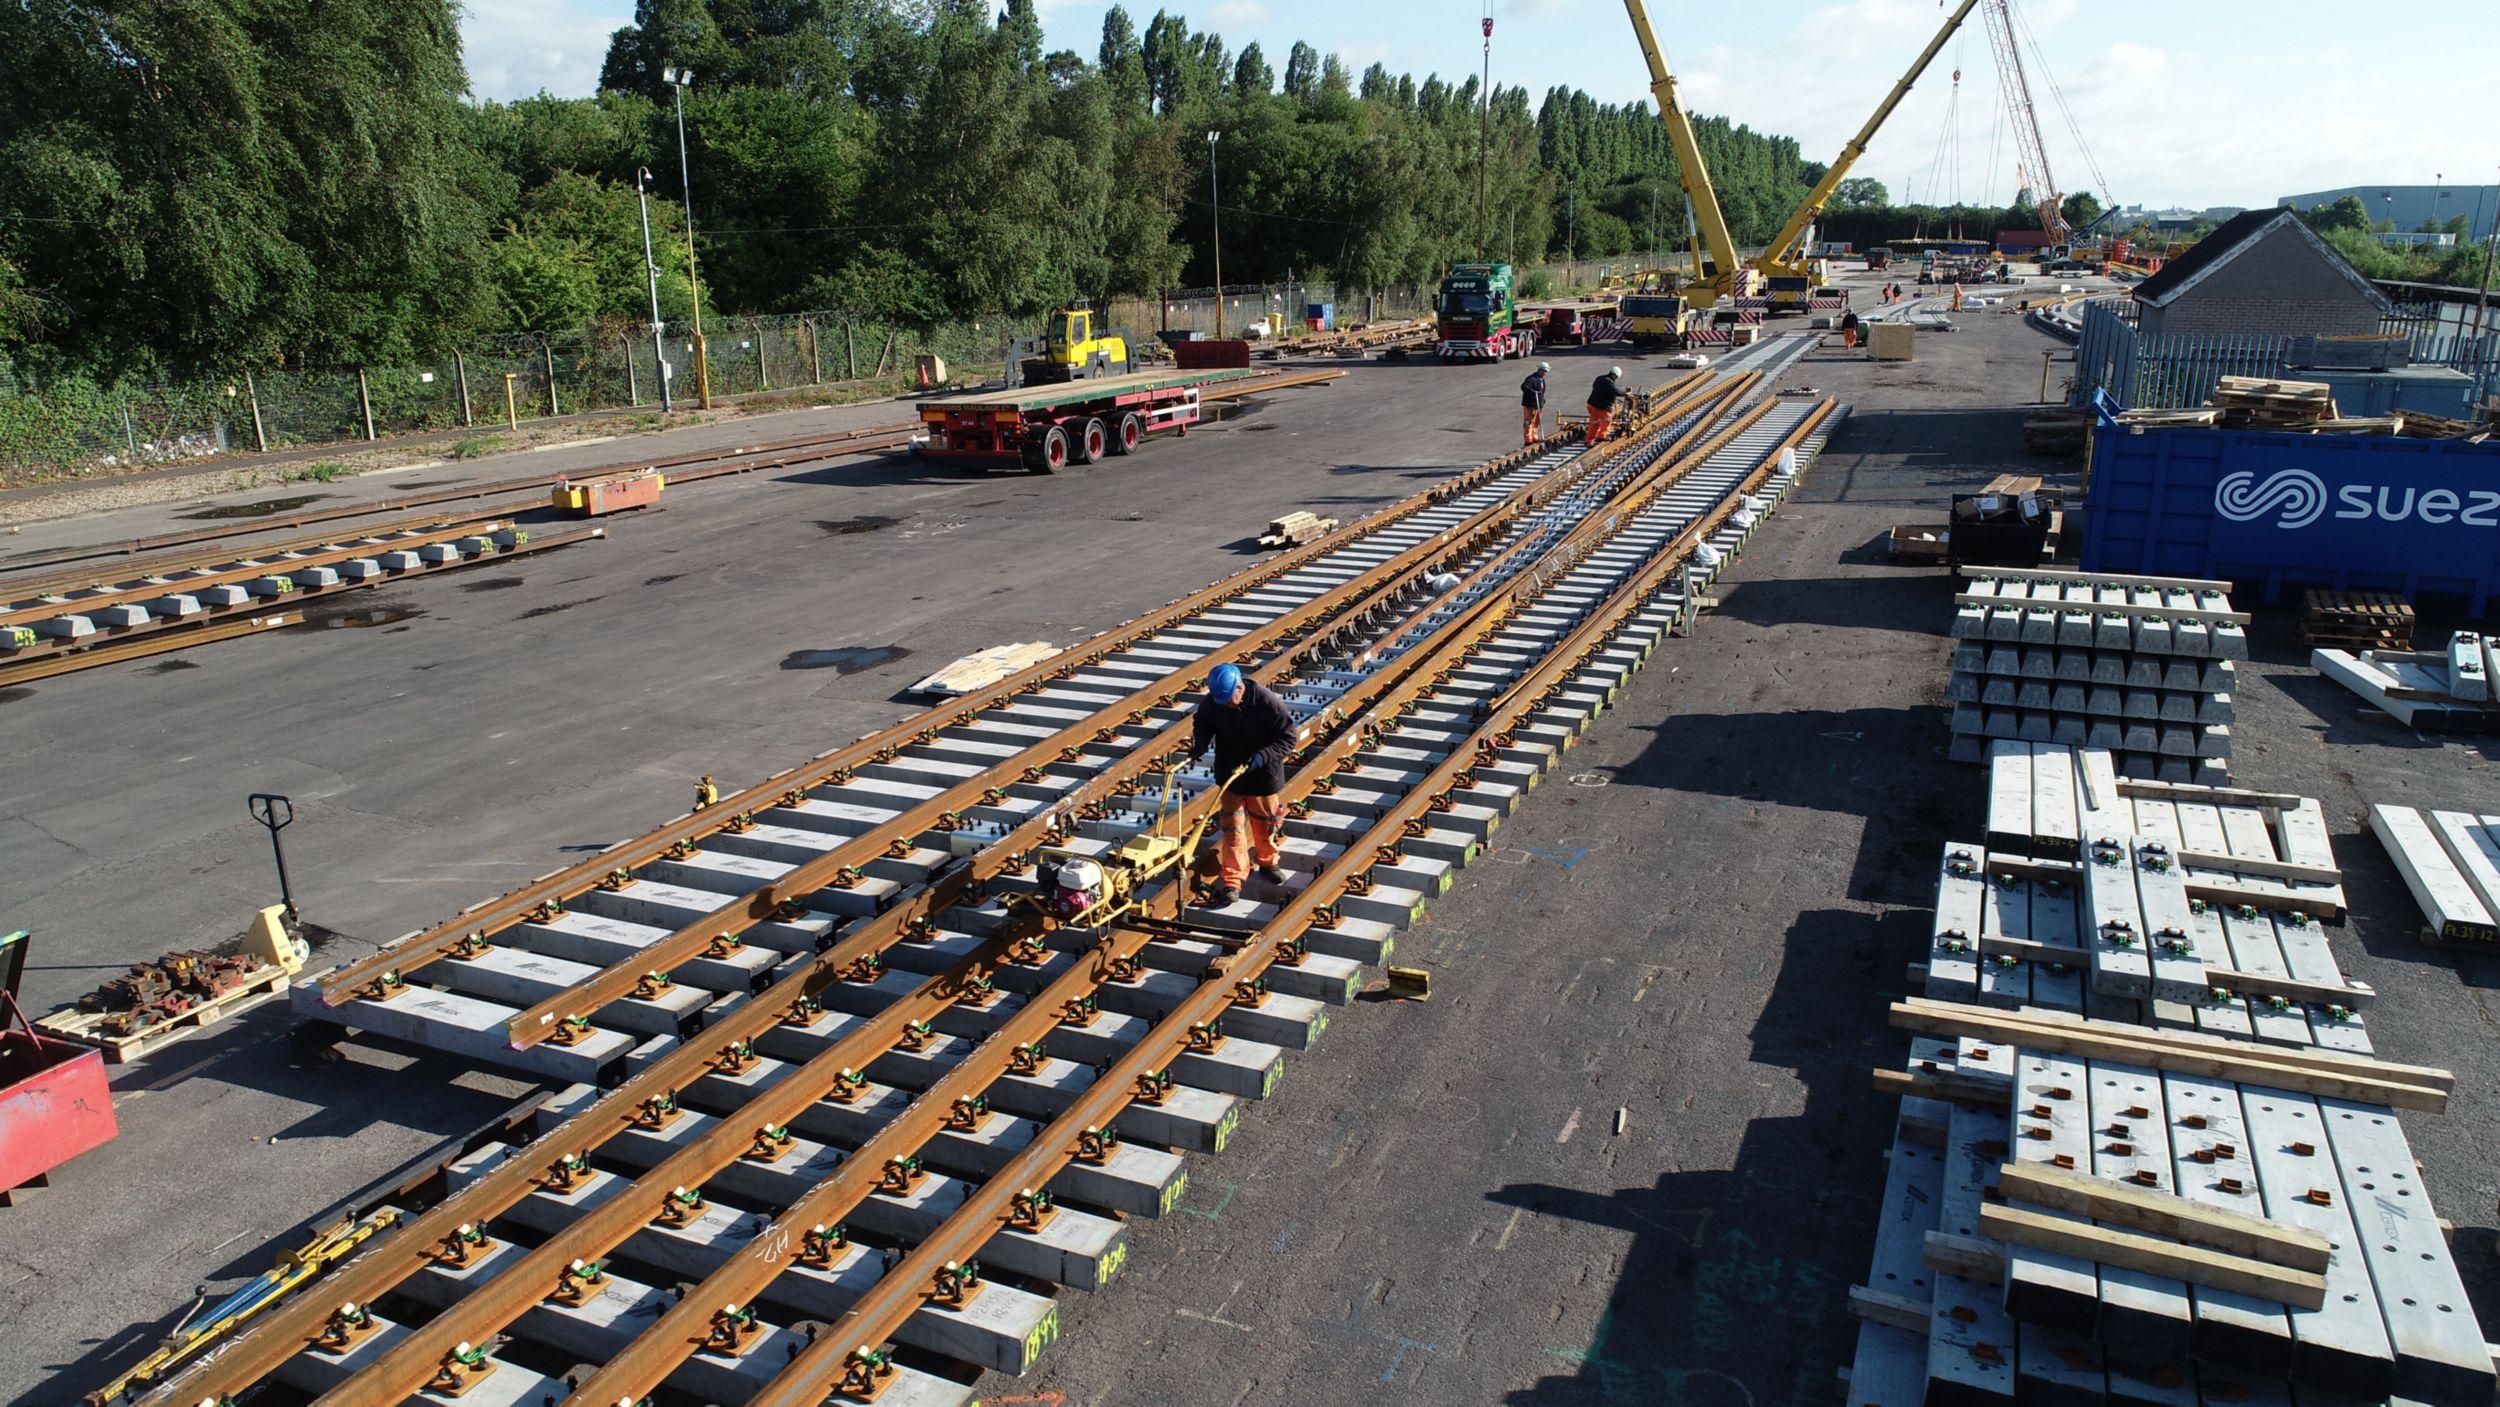 Beeston trackwork assembly